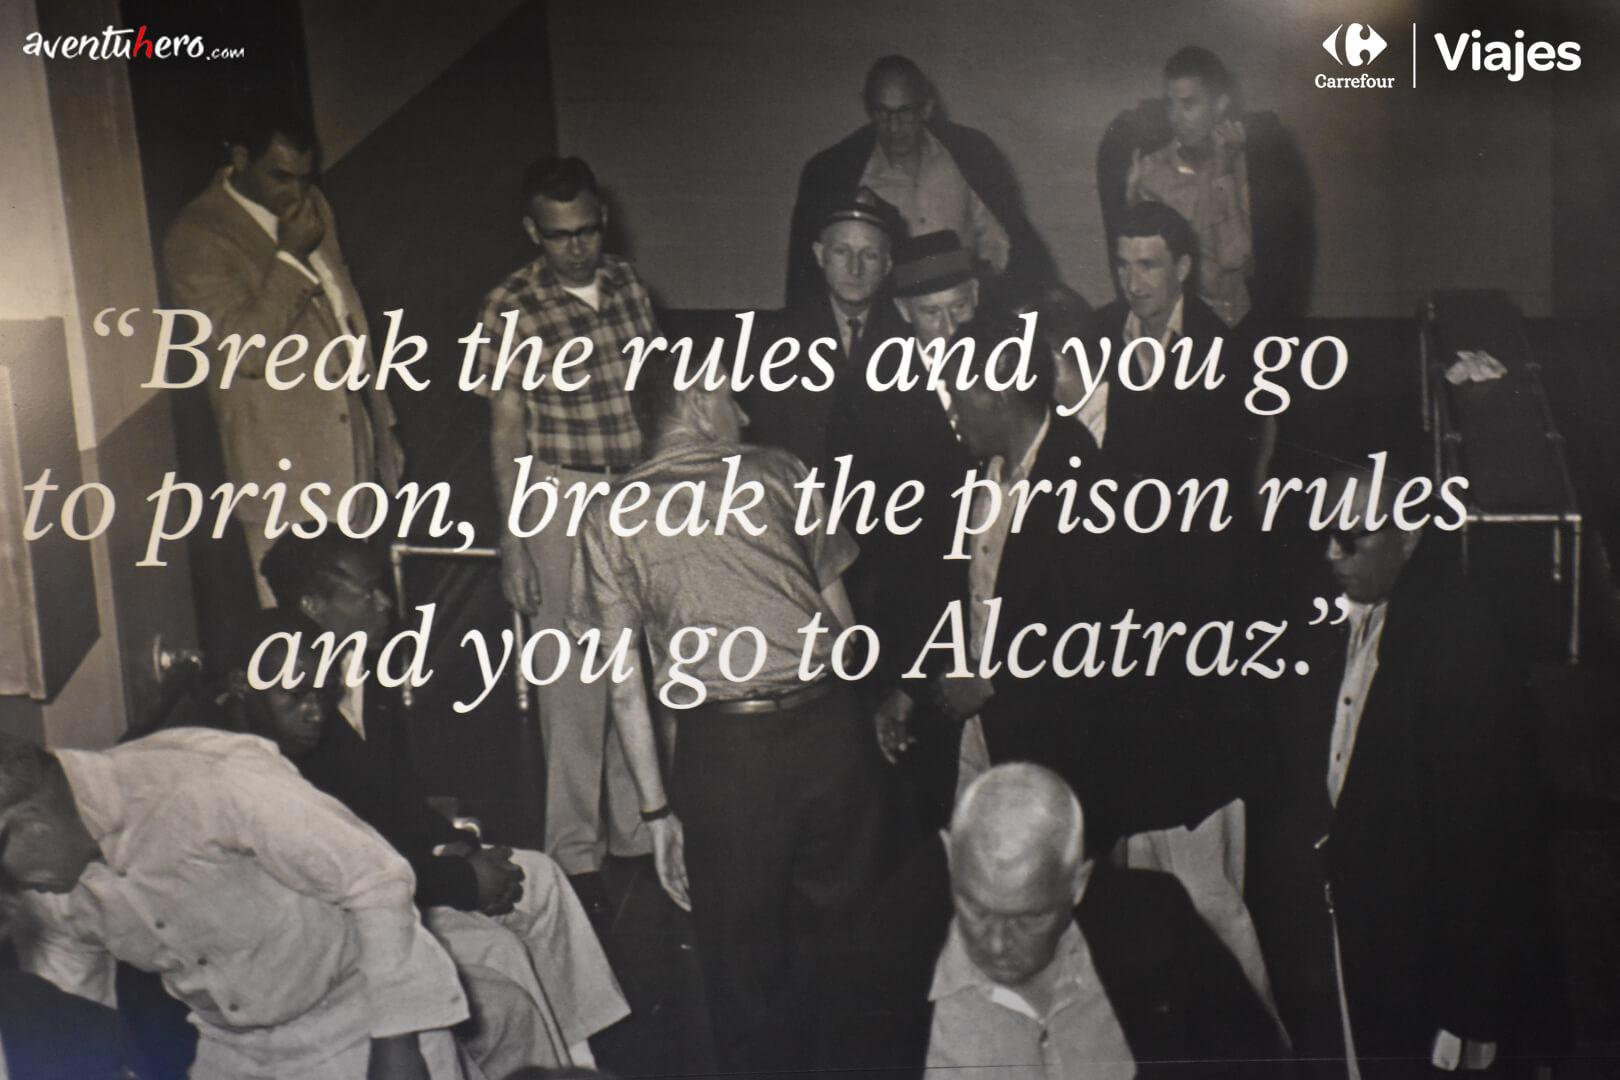 Alcatraz - If you break the rules